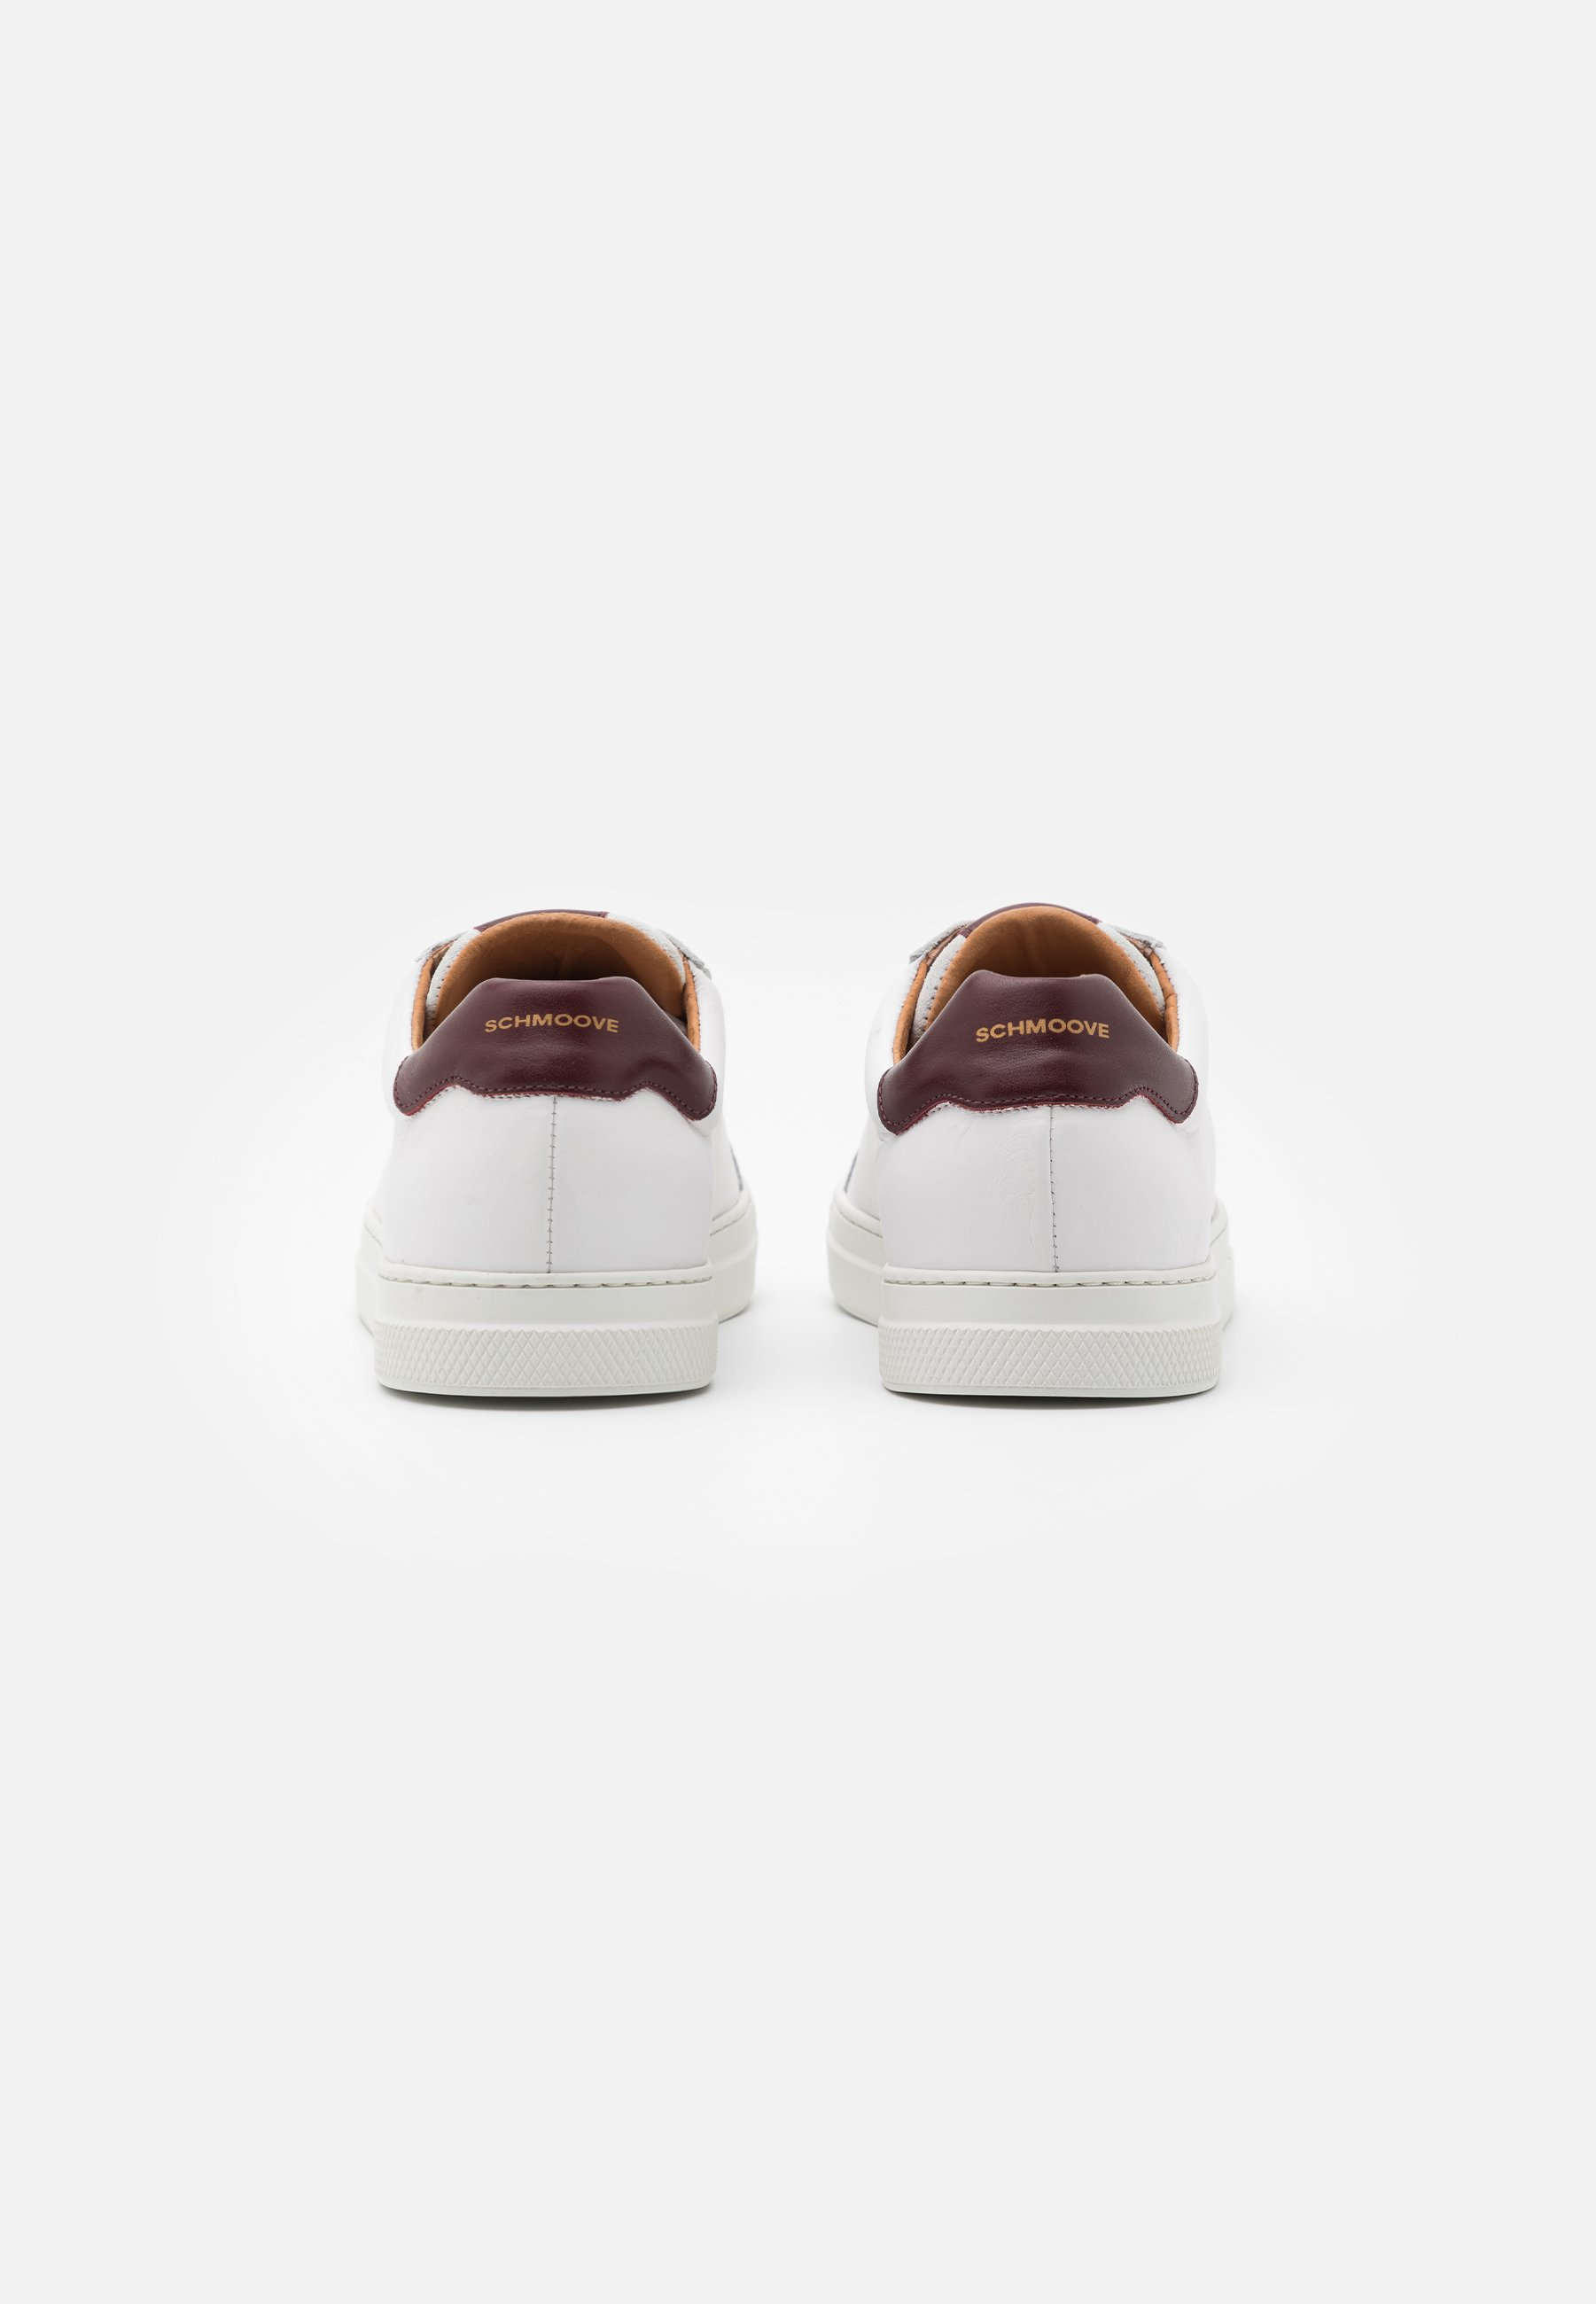 Schmoove SPARK CLAY - Sneaker low - white/bordeaux/weiß - Herrenschuhe YGO0c